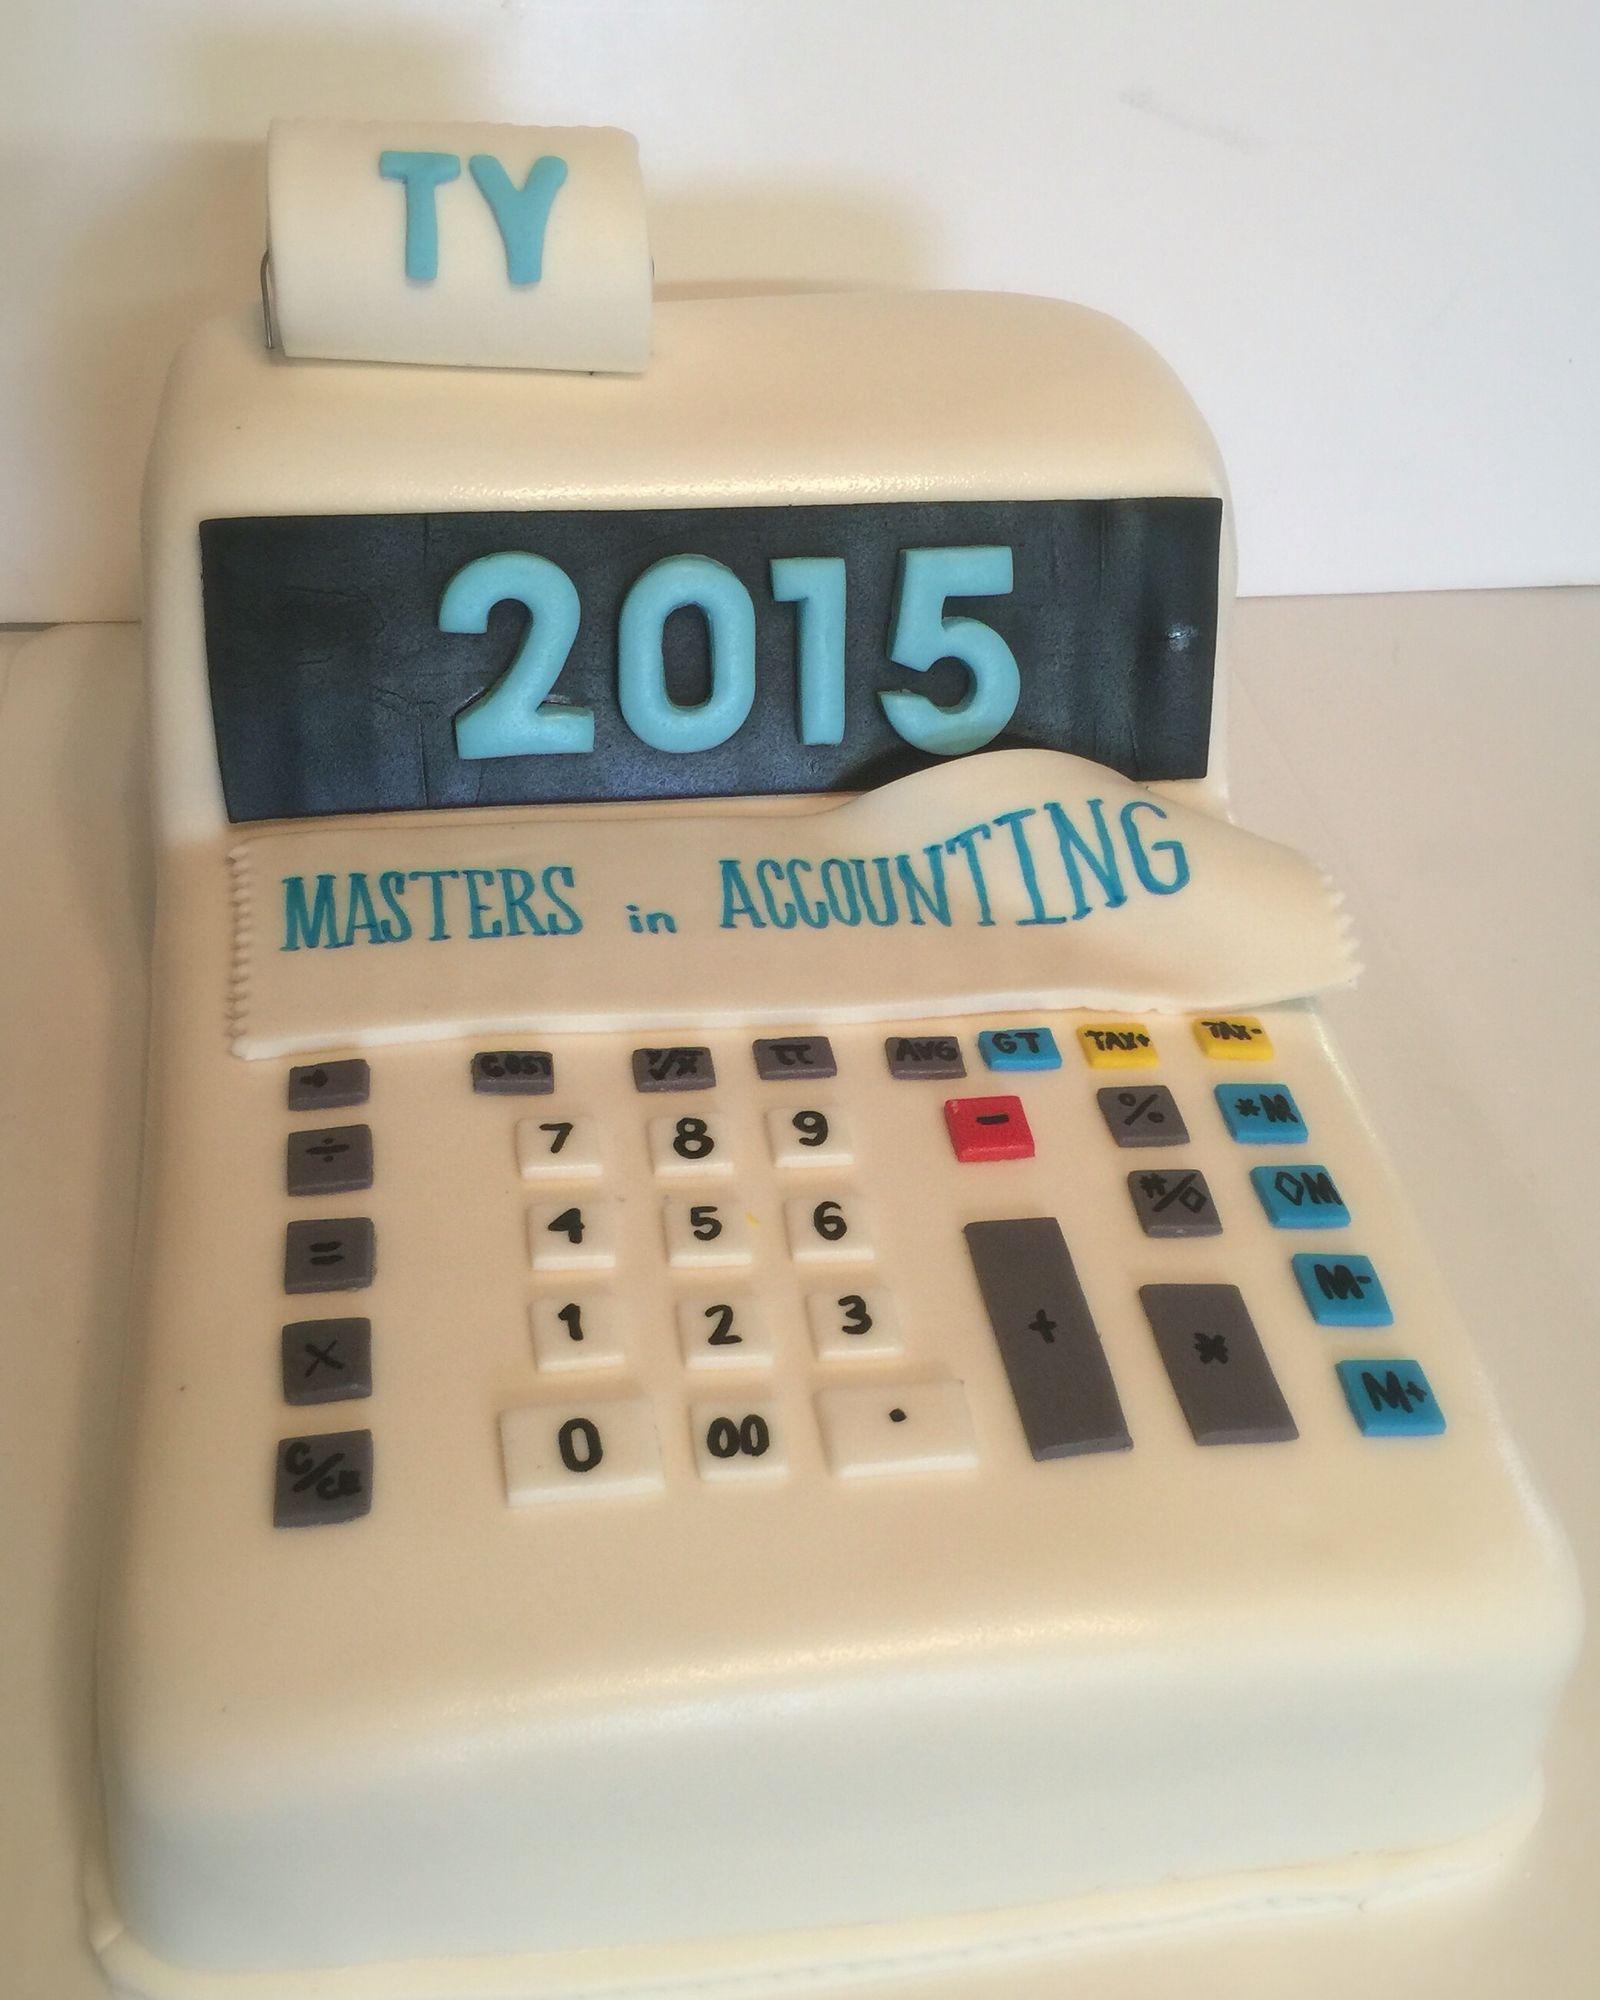 Accounting Calculator Graduation Cake Like us on Facebook